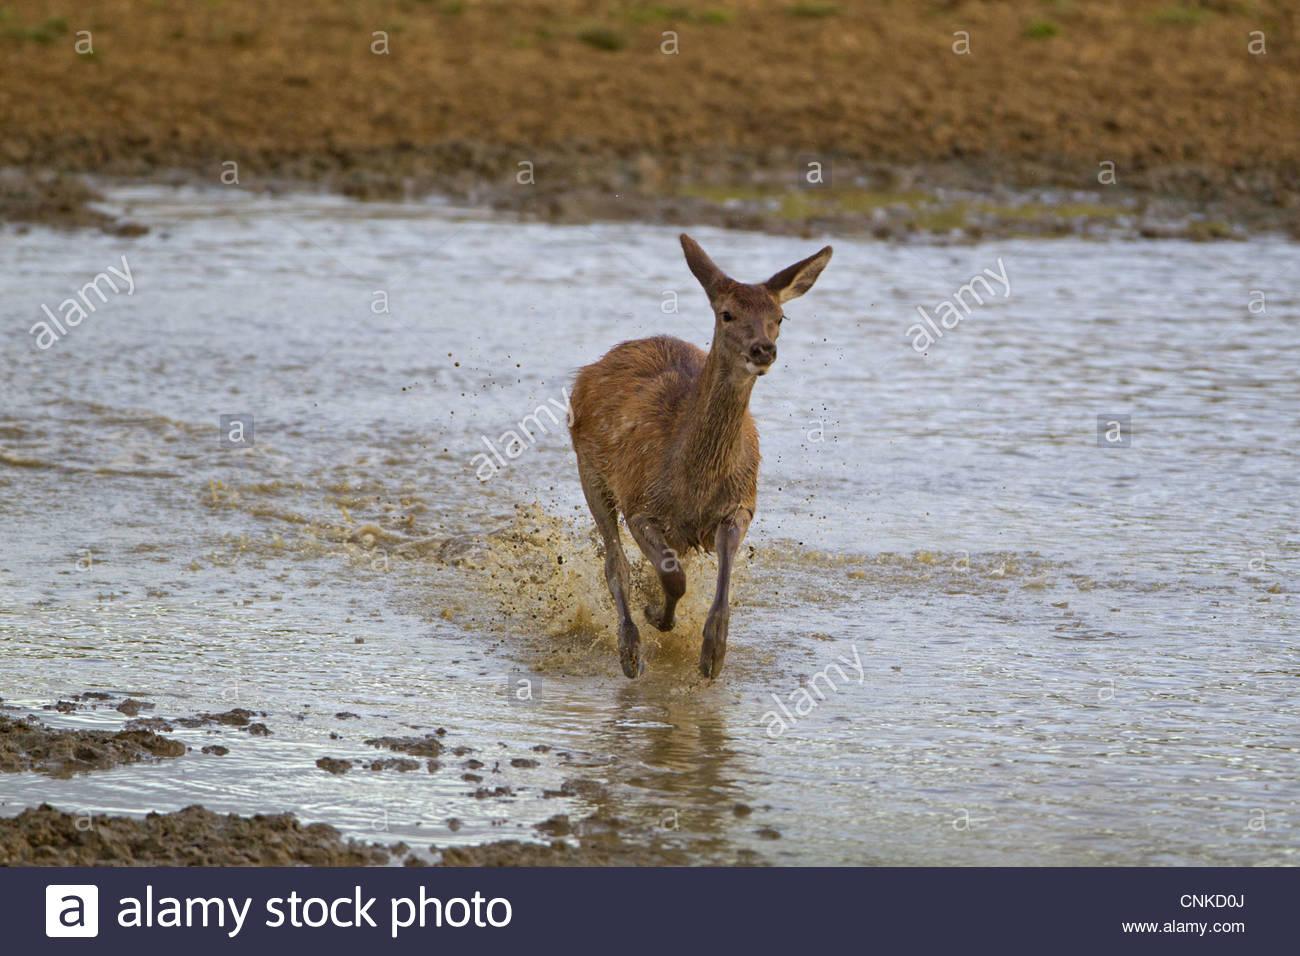 Red Deer Rut Minsmere High Resolution Stock Photography And regarding Deer Rut Westleton 2021